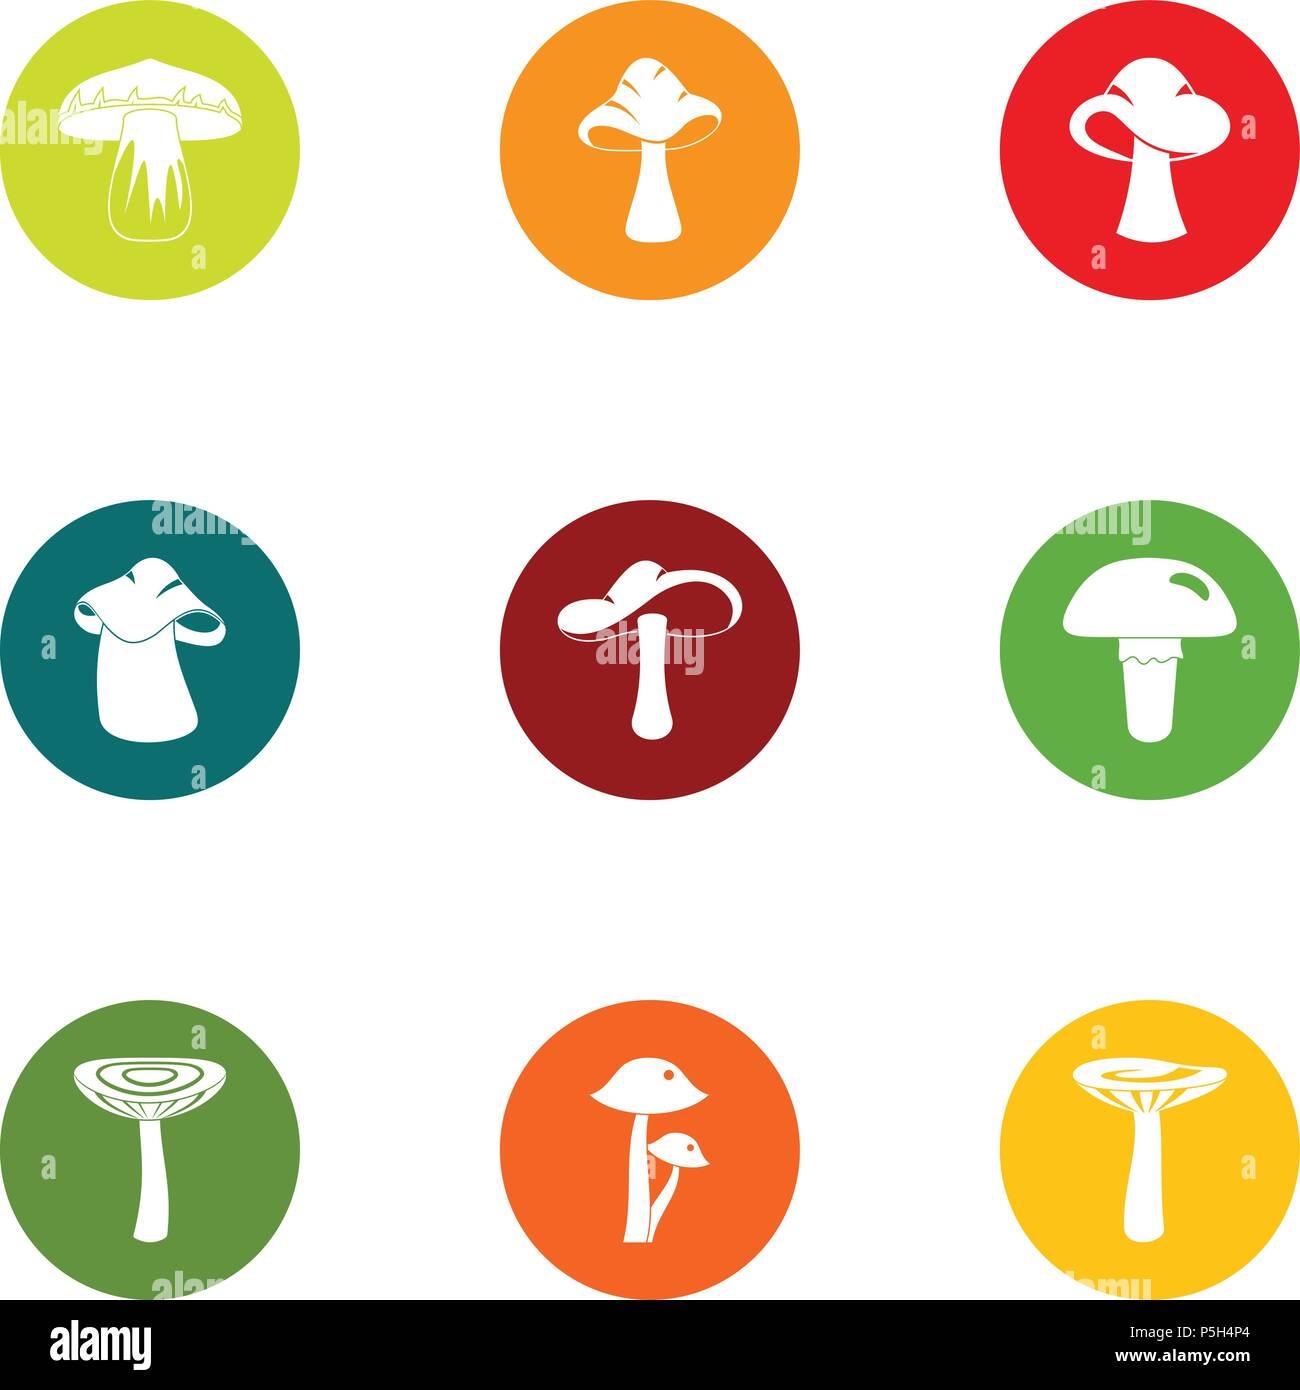 Mushroom colony icons set, flat style - Stock Vector